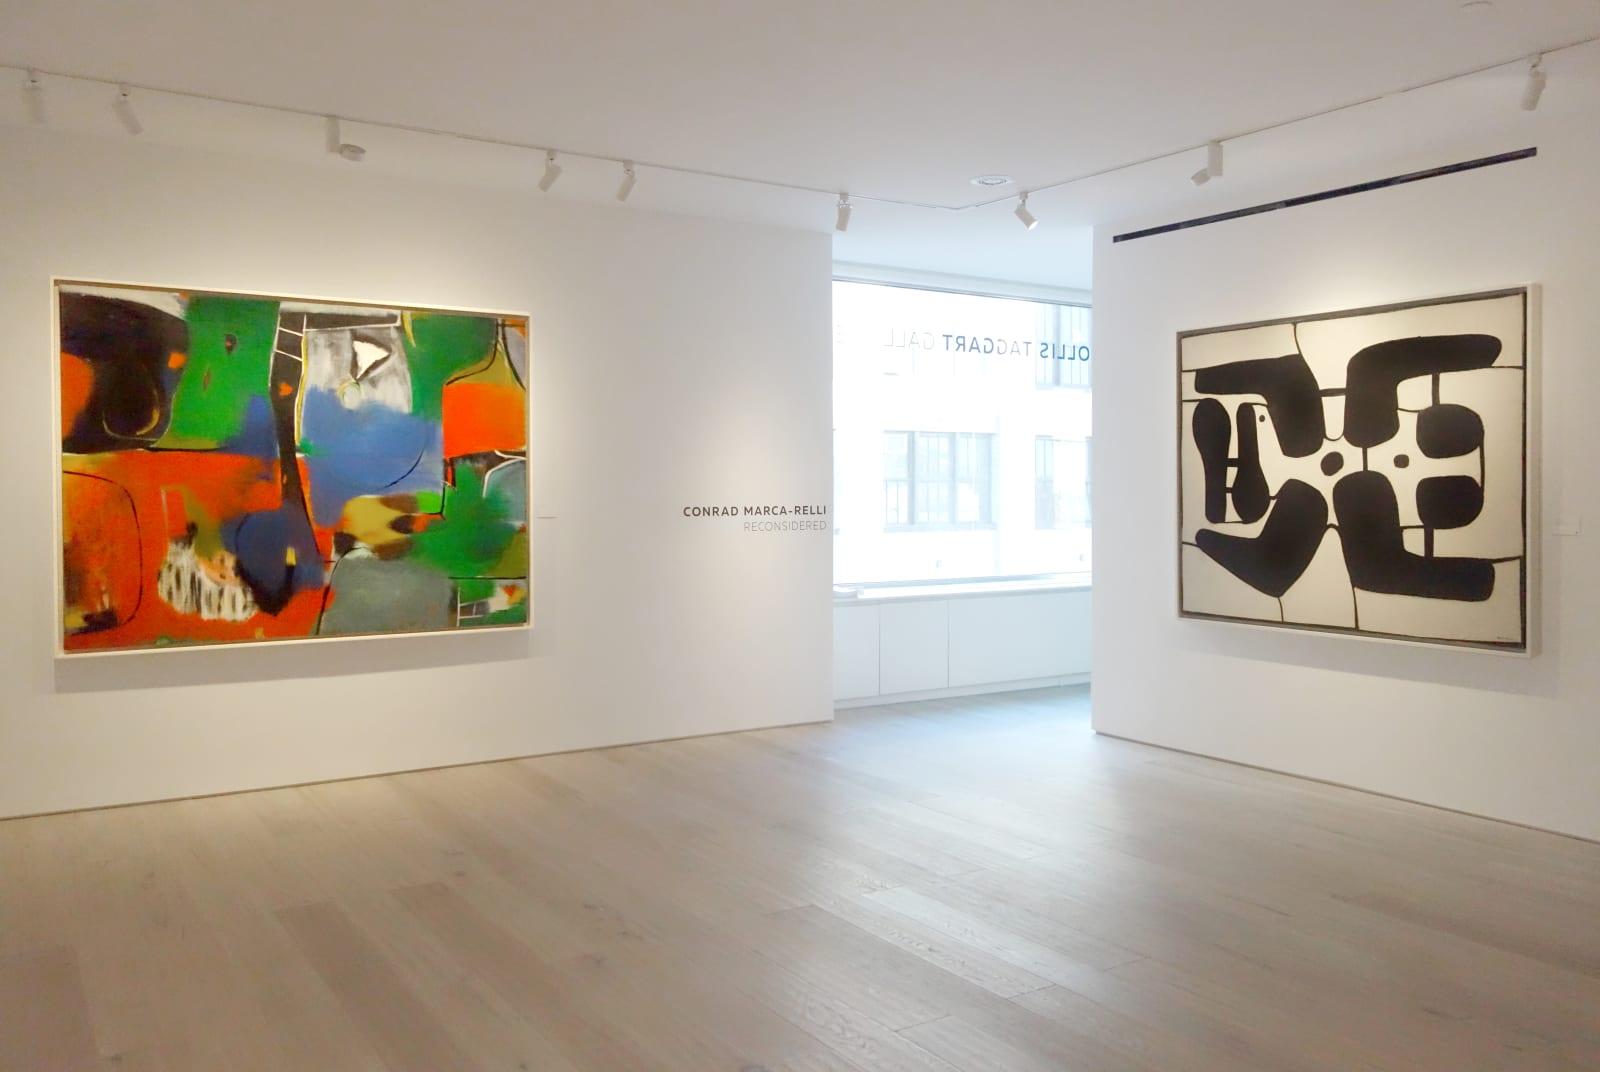 Installation view: Conrad Marca-Relli: Reconsidered